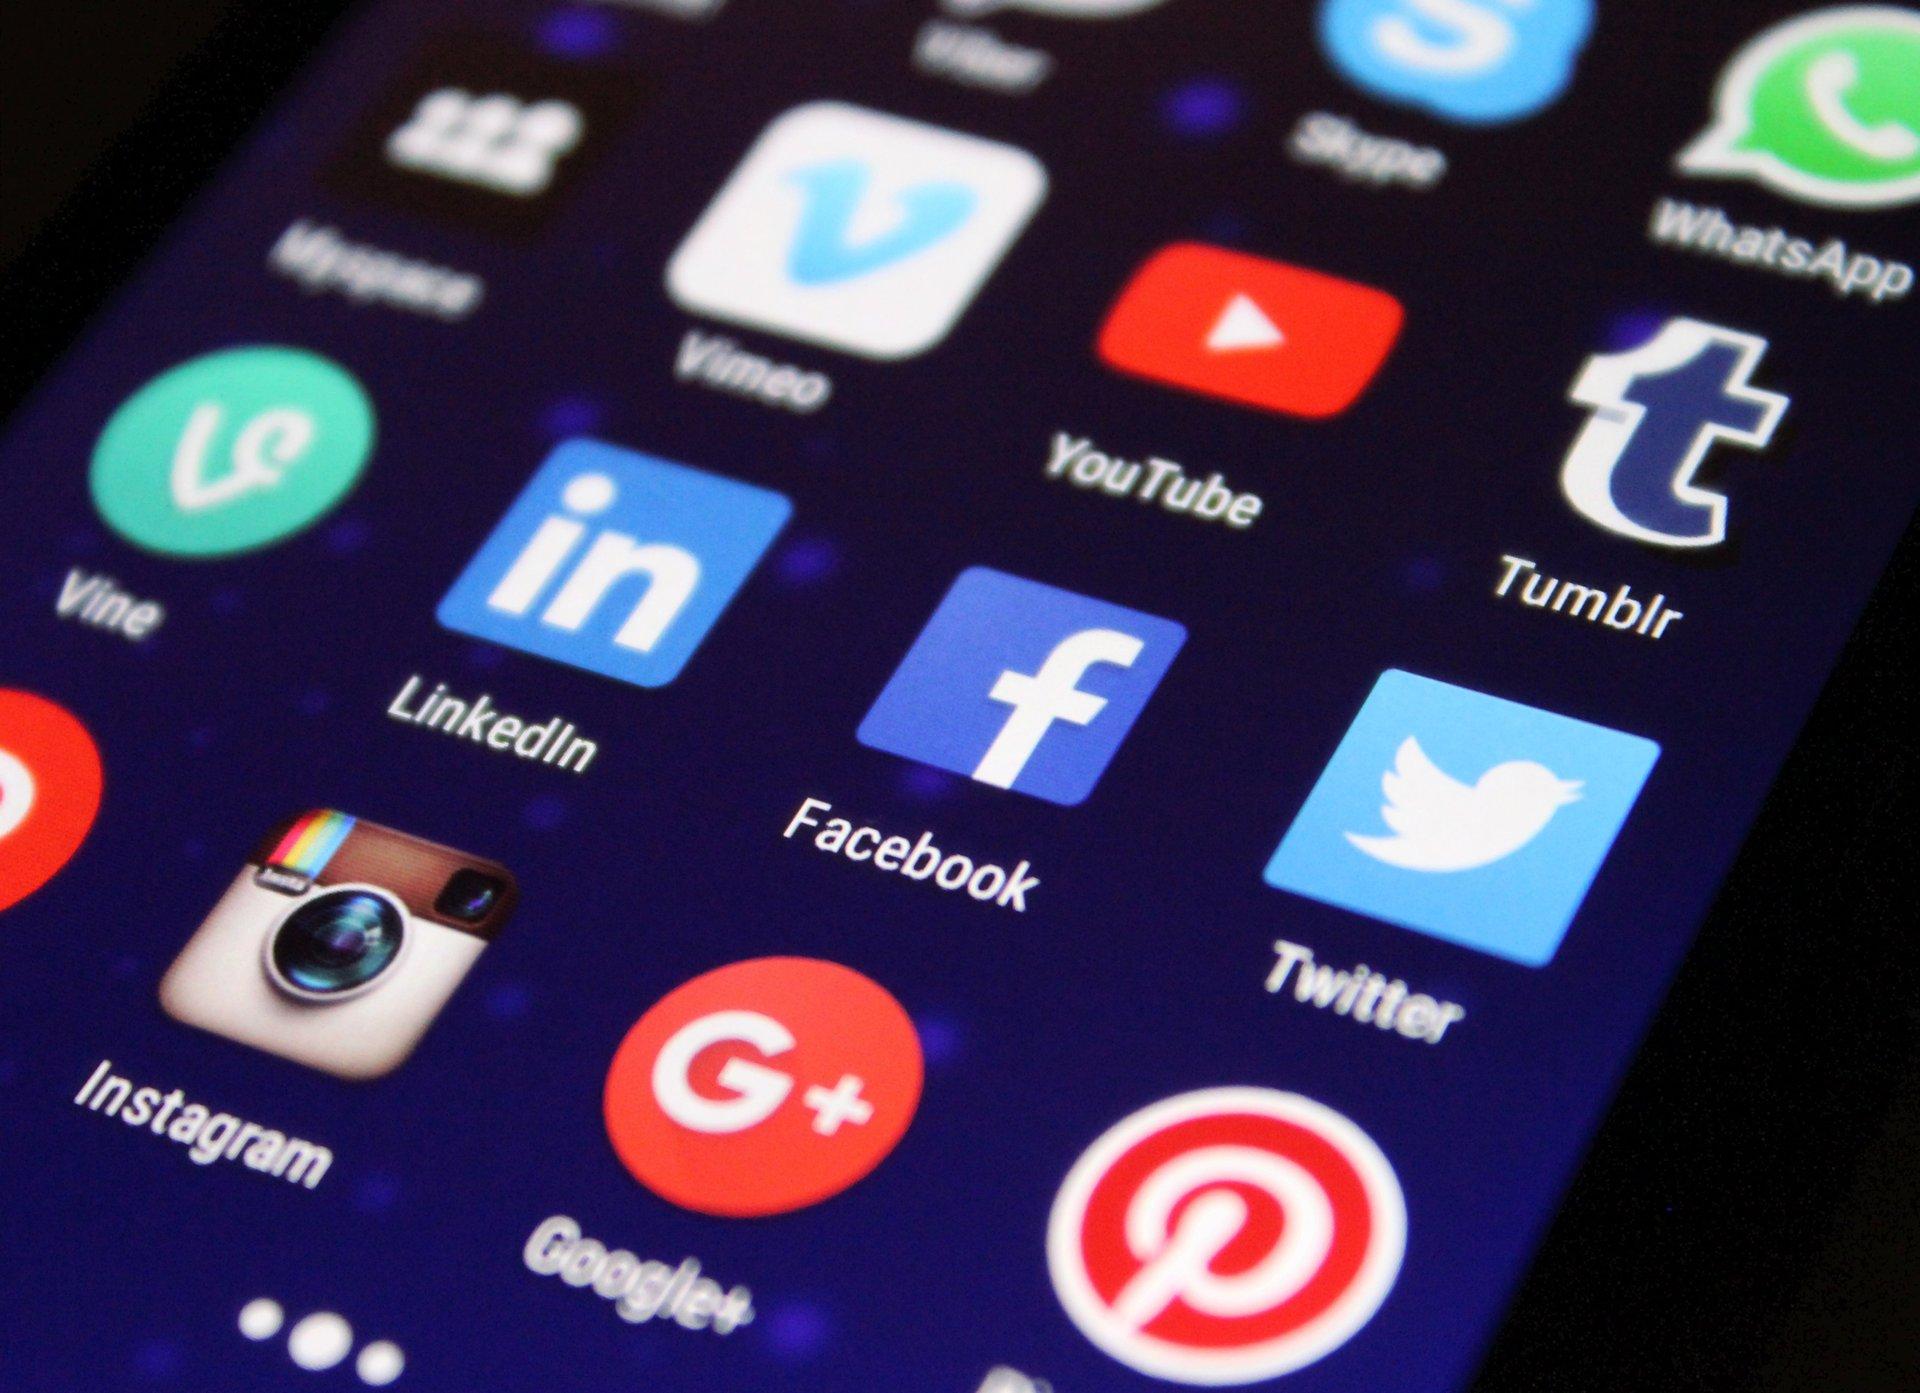 sociale medier symboler